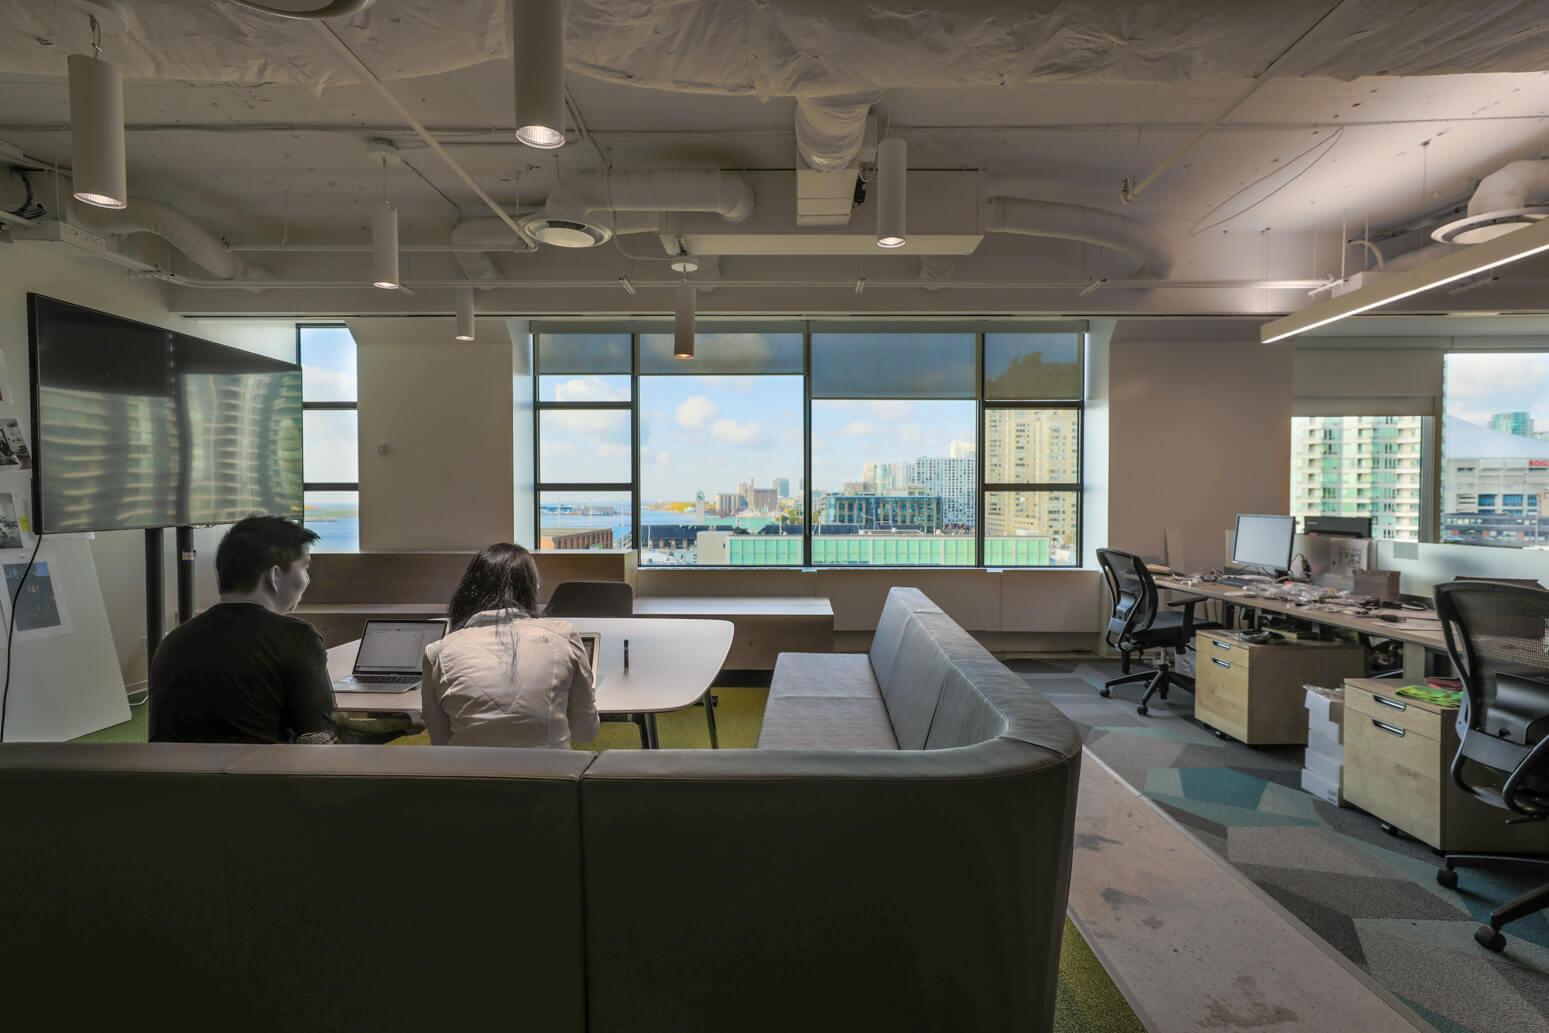 Ecobee Toronto Office Killer Spaces-18